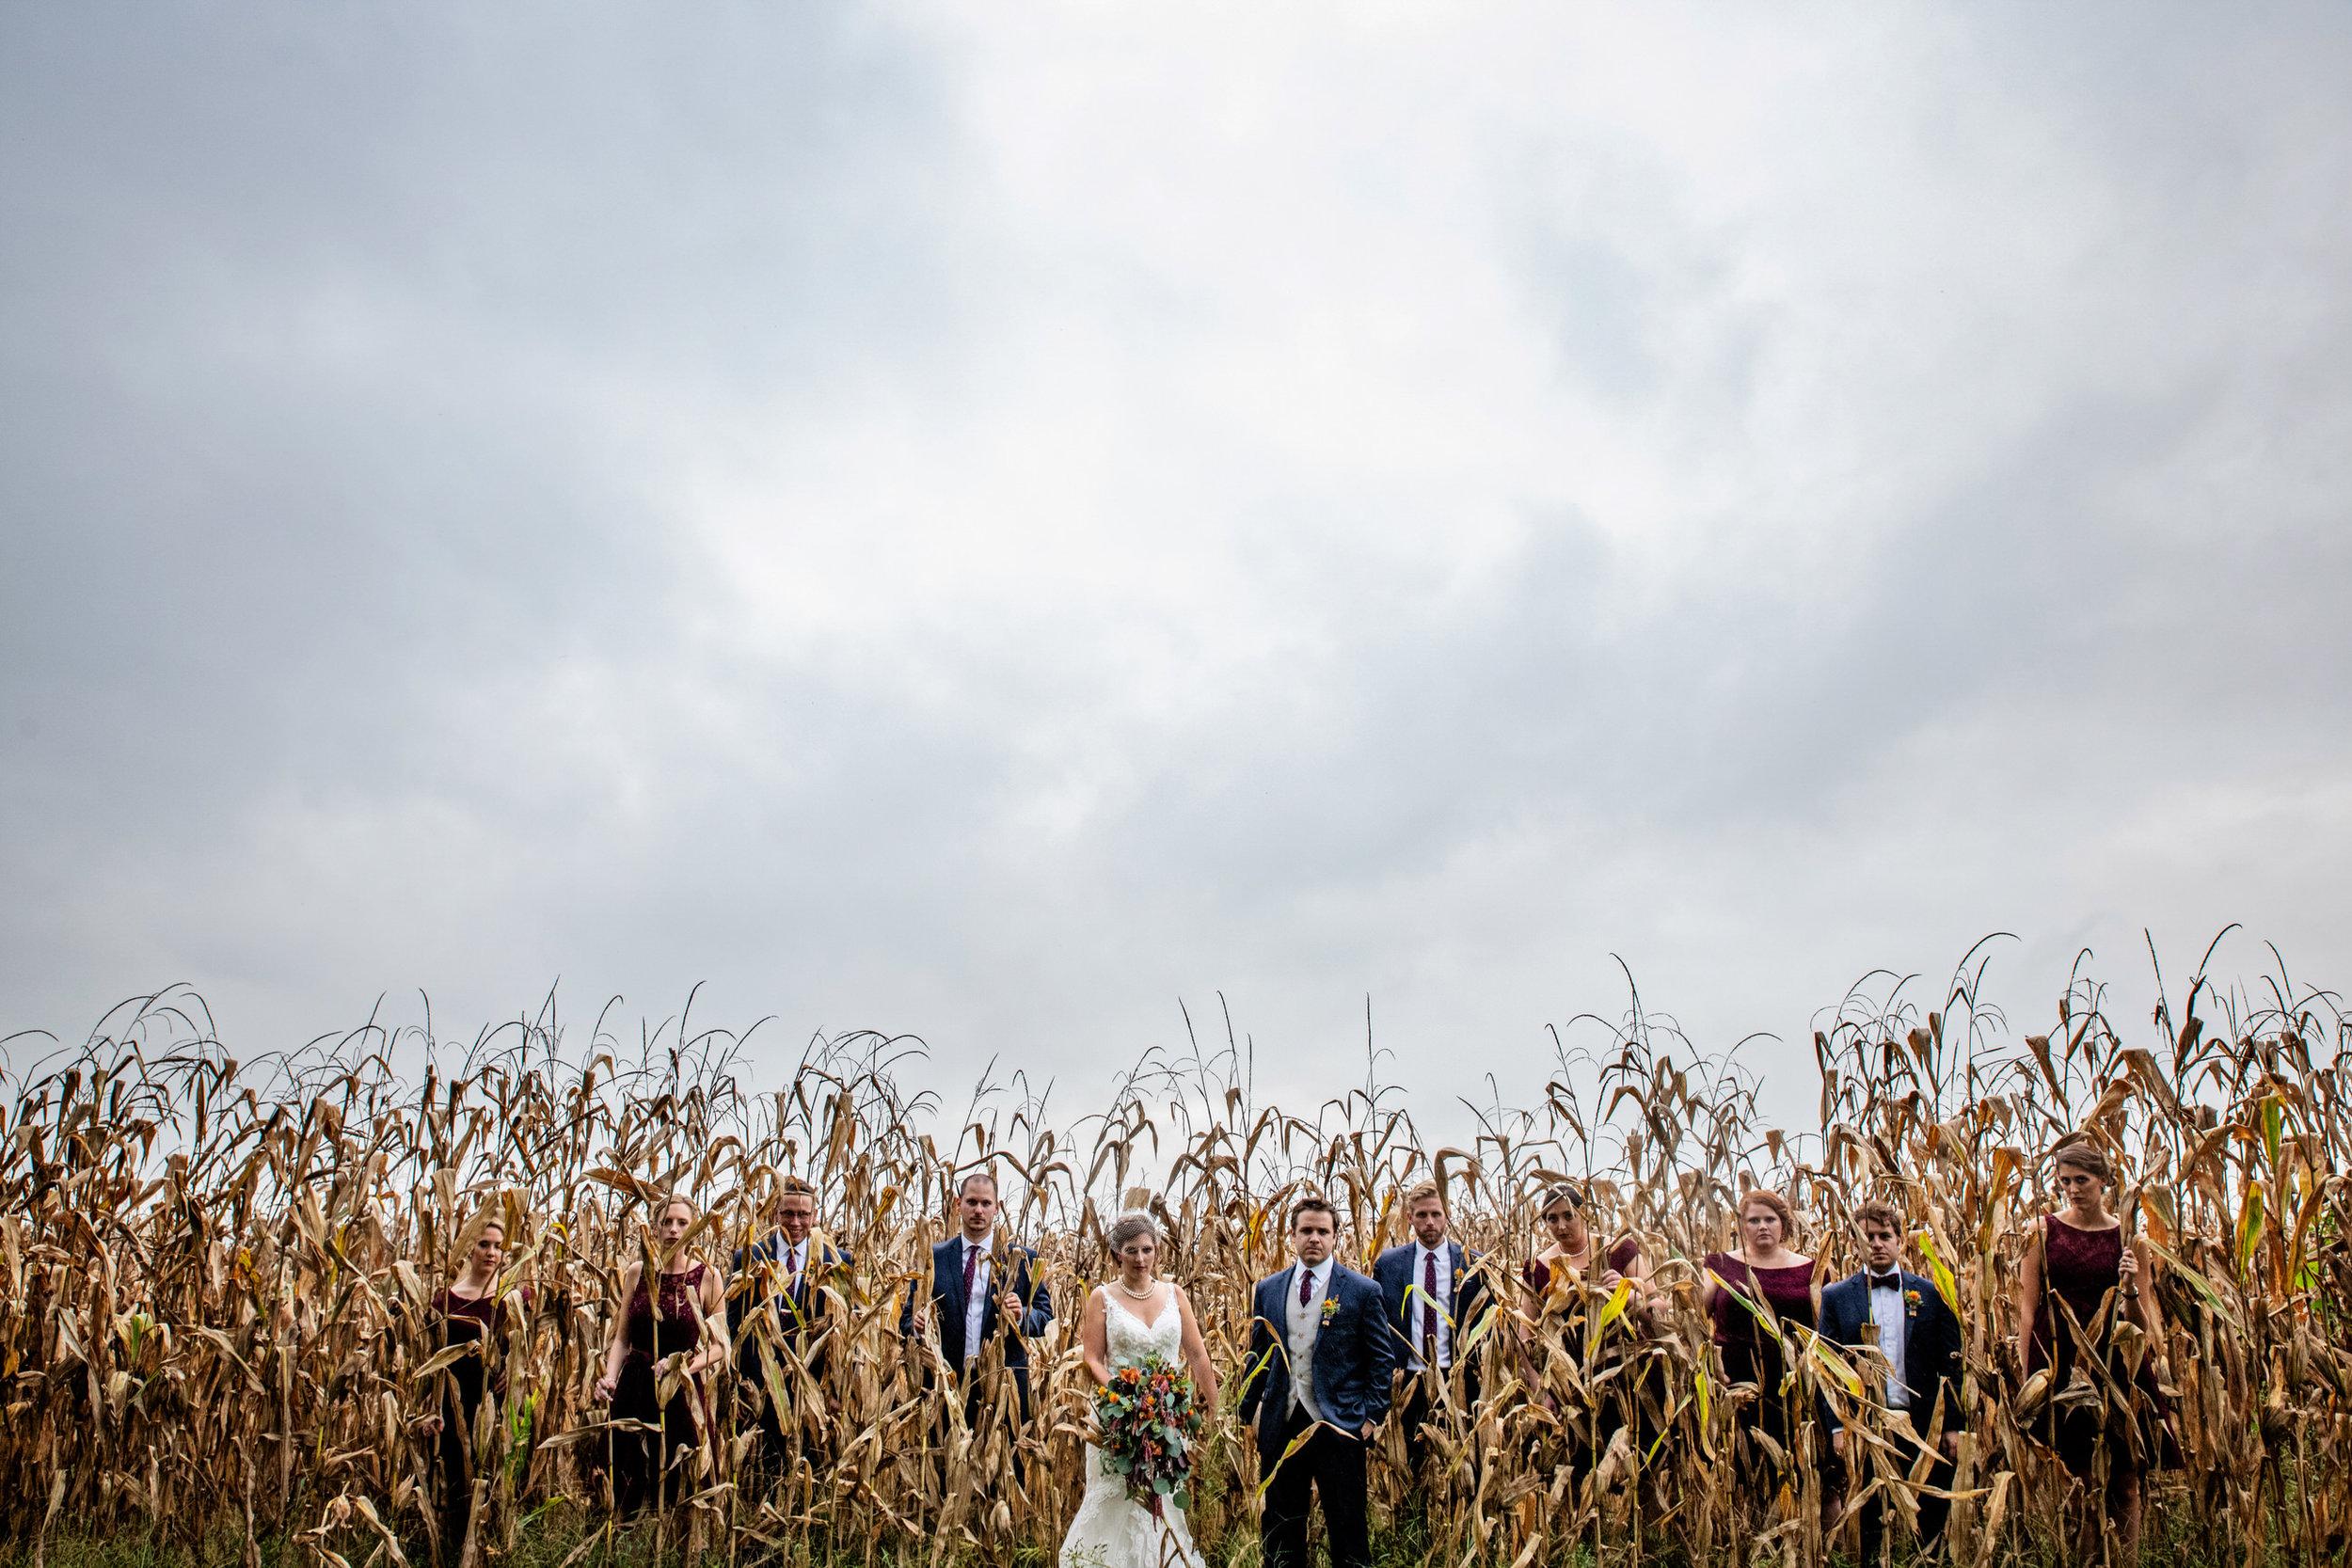 WalkersOverlookWedding-Angela&Ben-WeddingParty-22.jpg